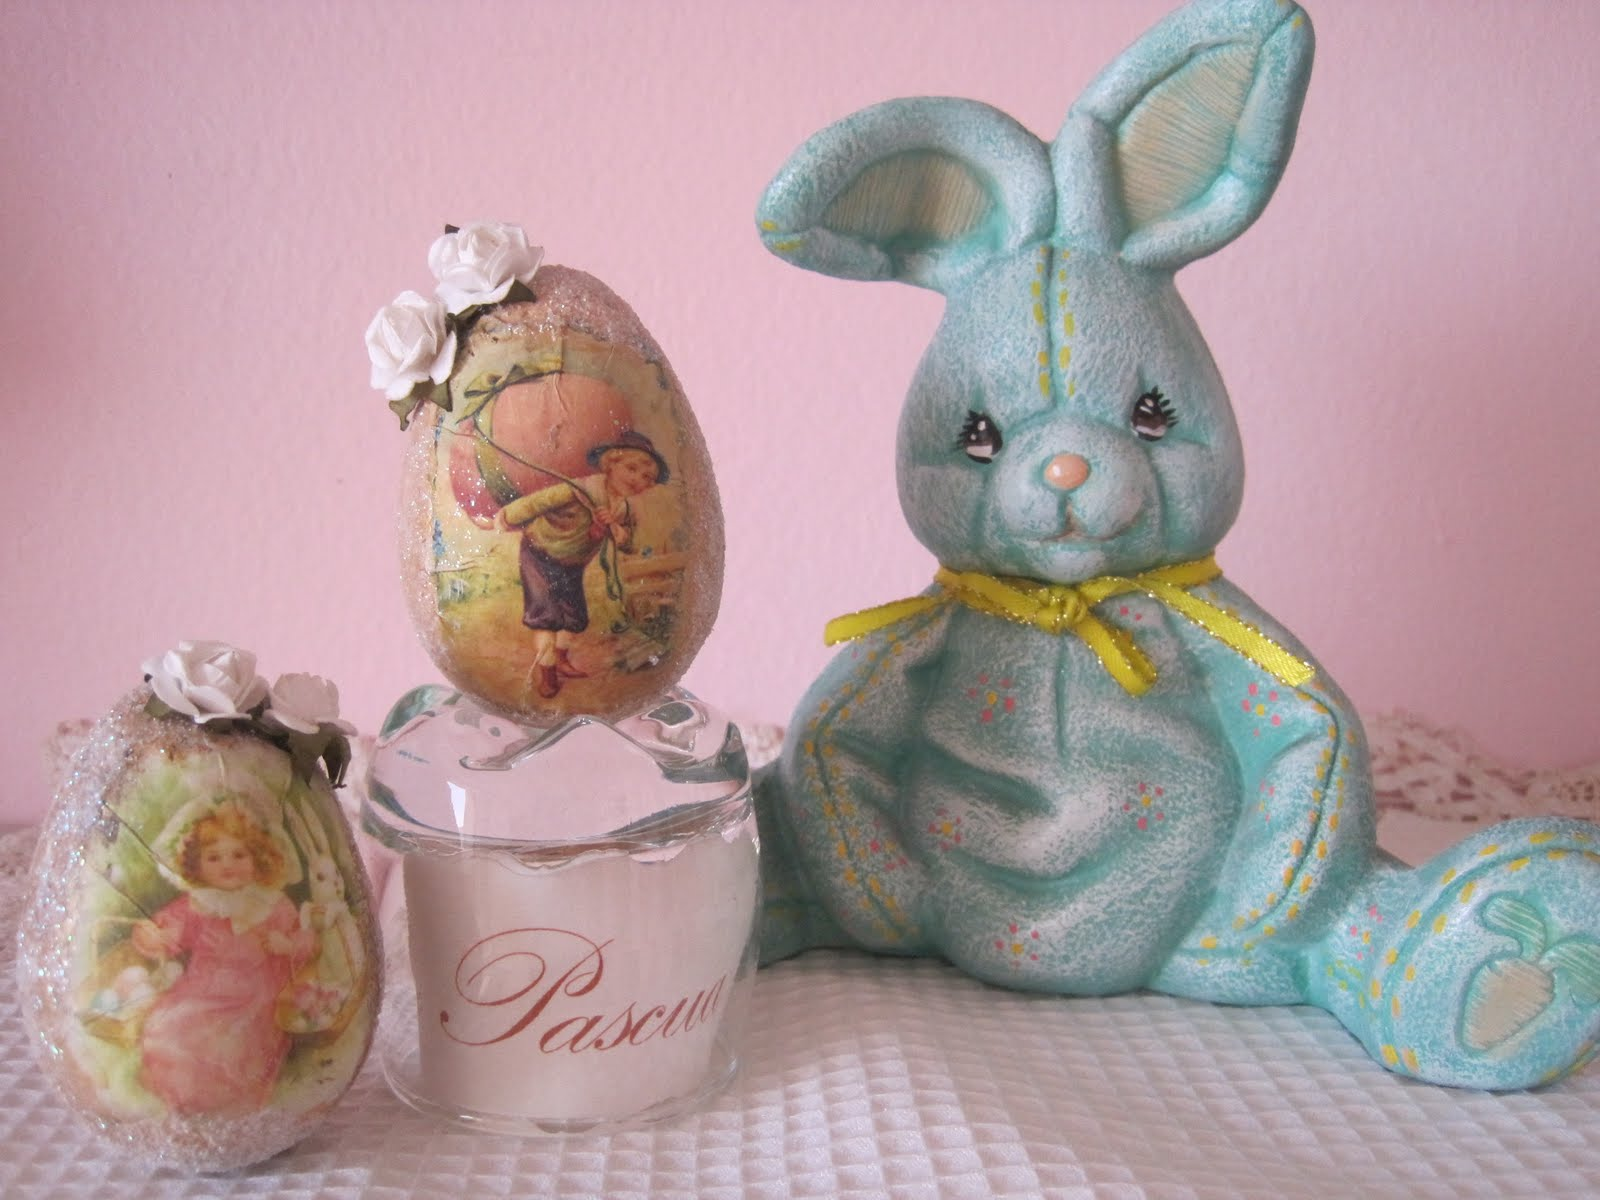 Atelier de Charo: Decoración Vintage de Pascua - Vintage Easter Decor